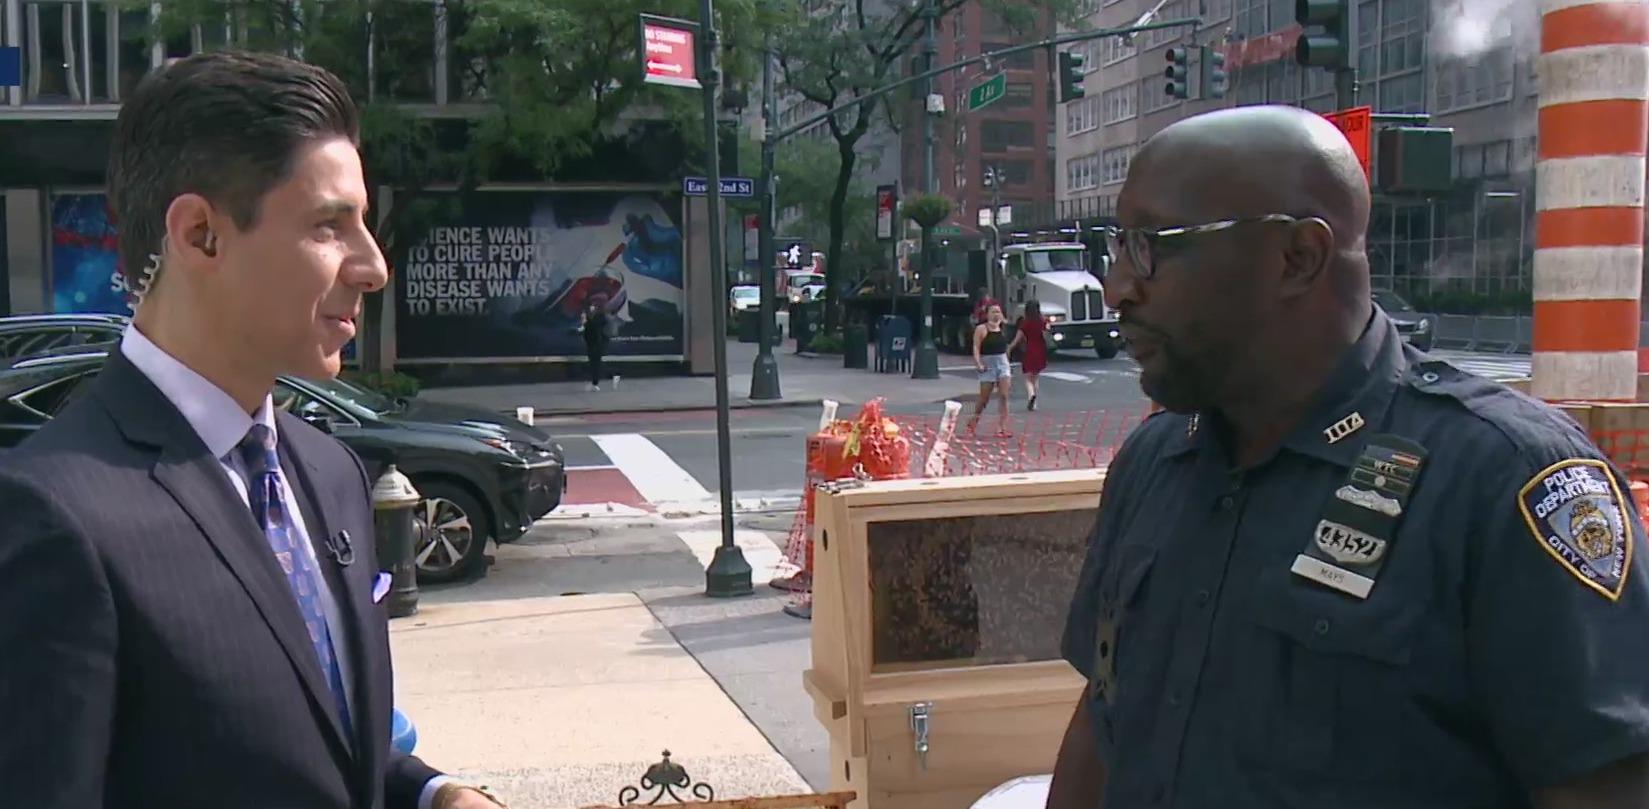 NYPD beekeeper Officer Darren Mays and PIX11's Dan Mannarino